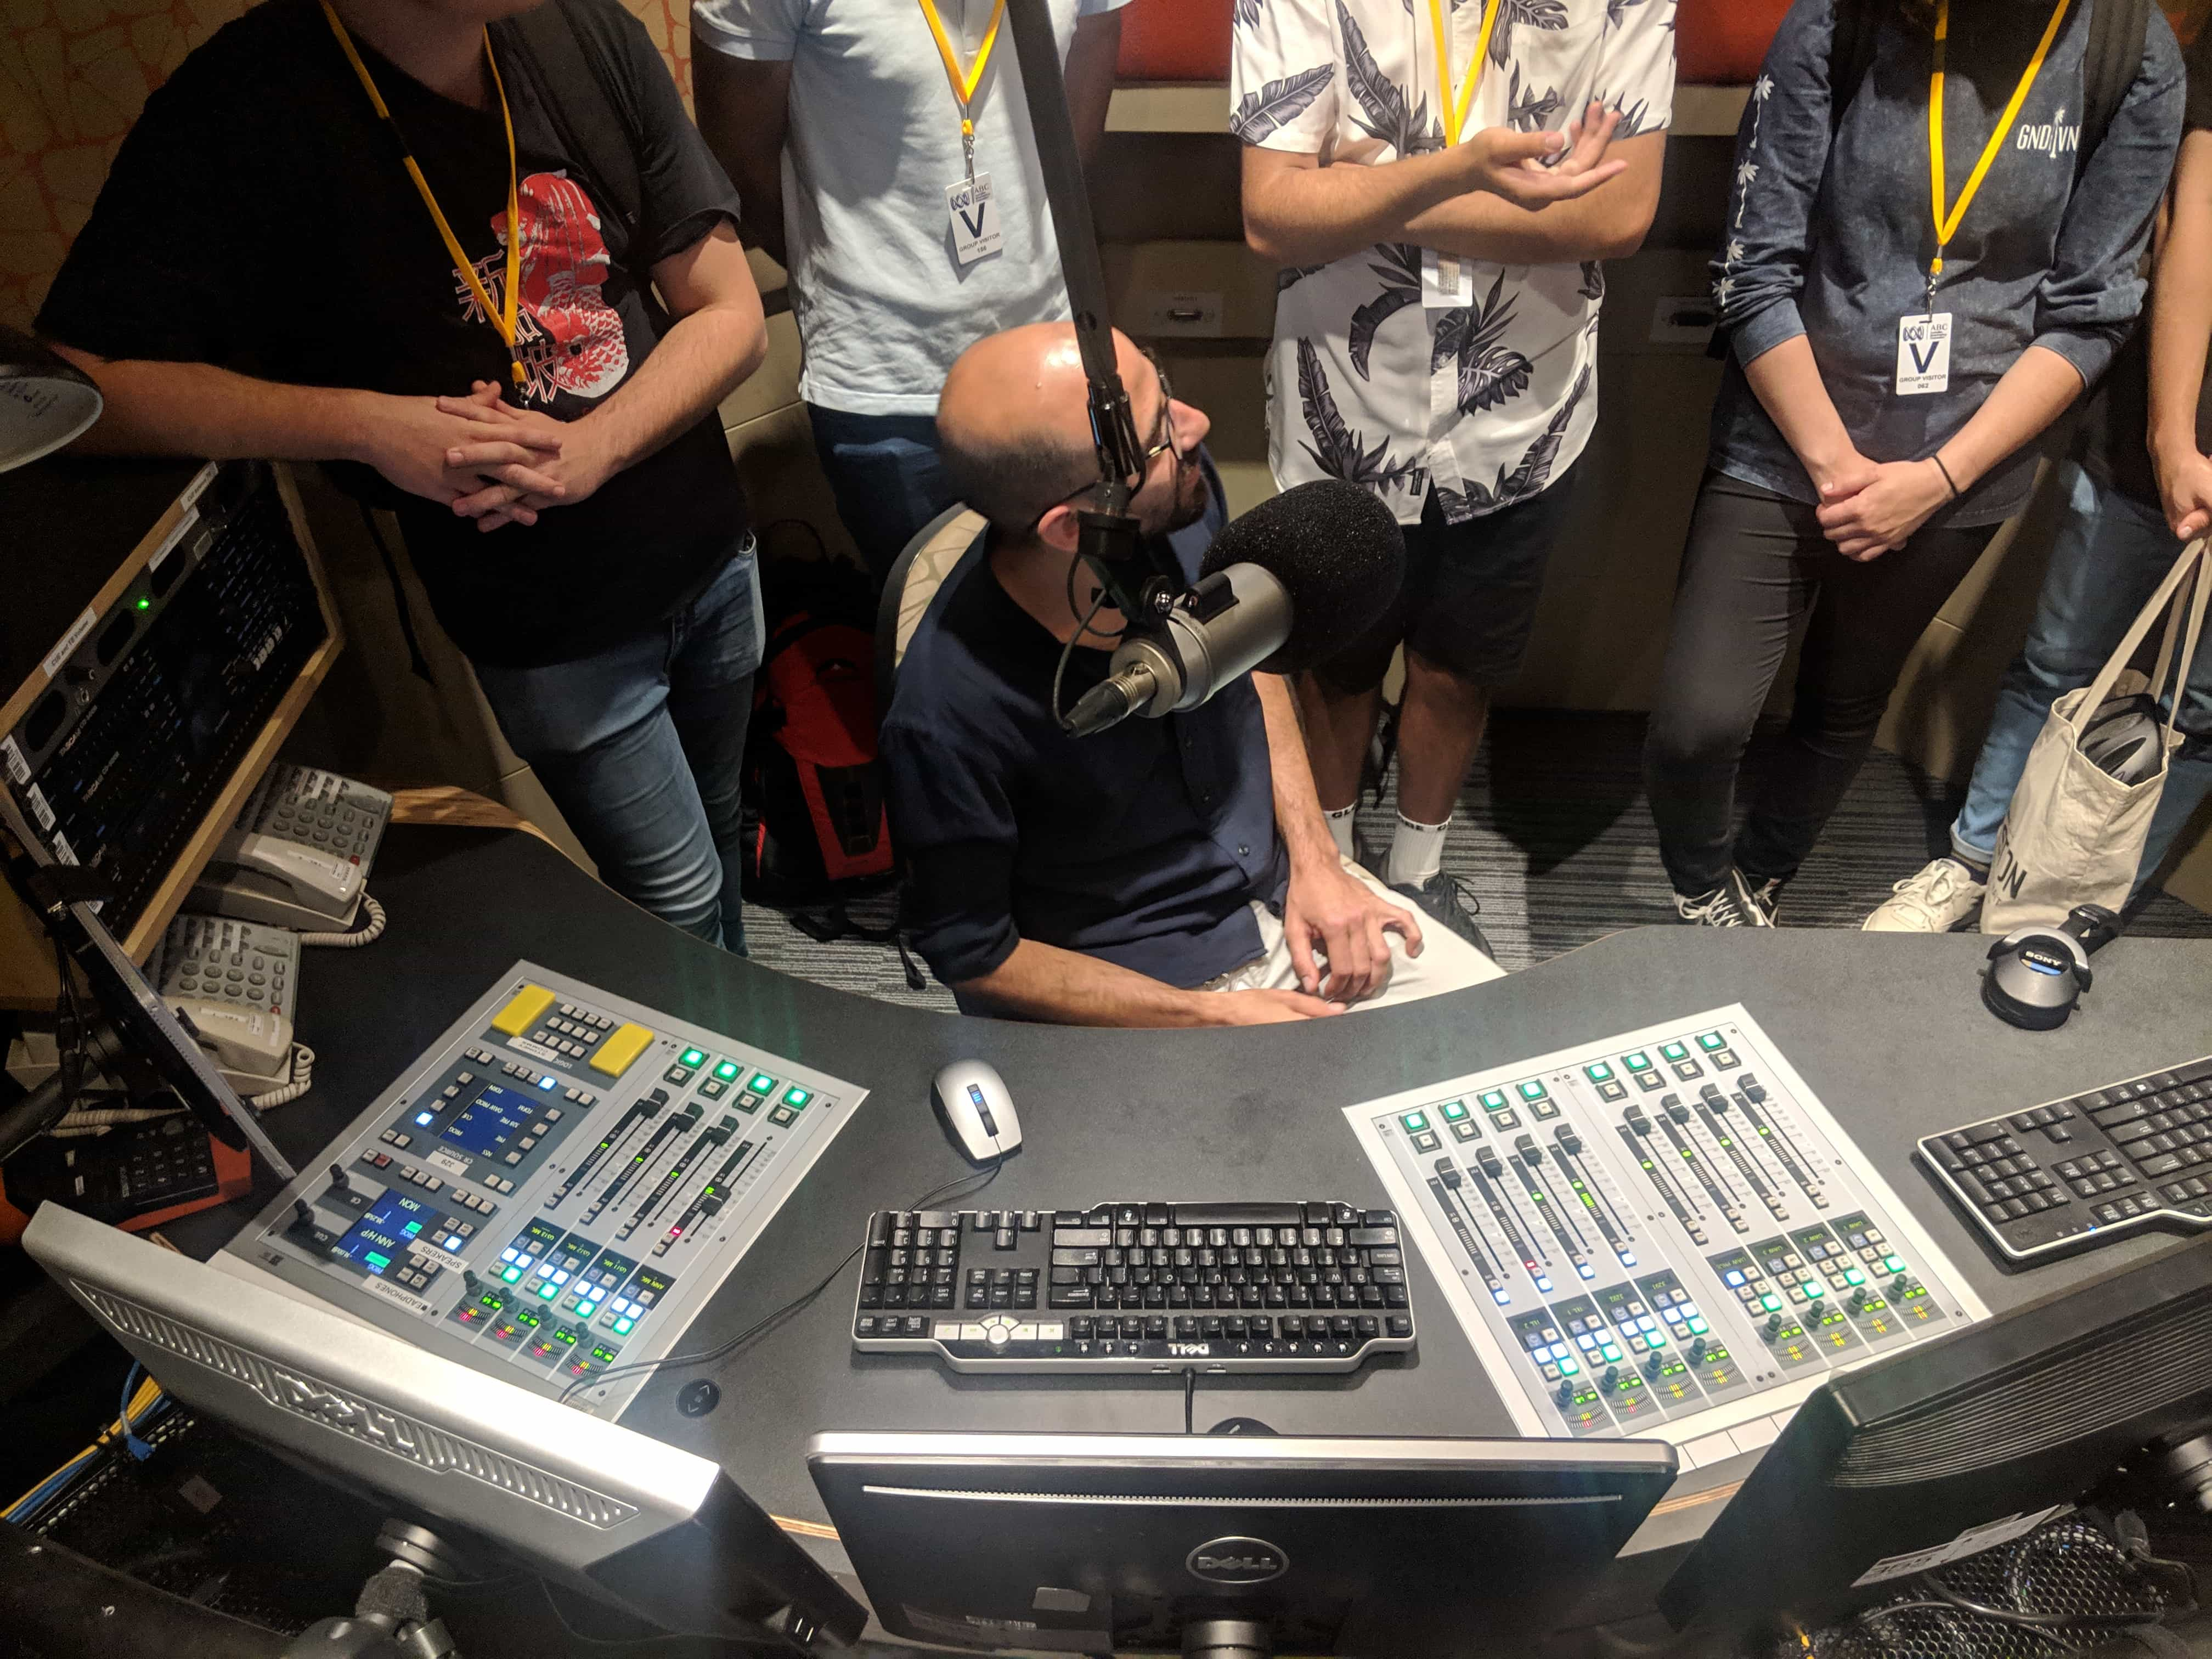 Oren teaching interns about broadcast